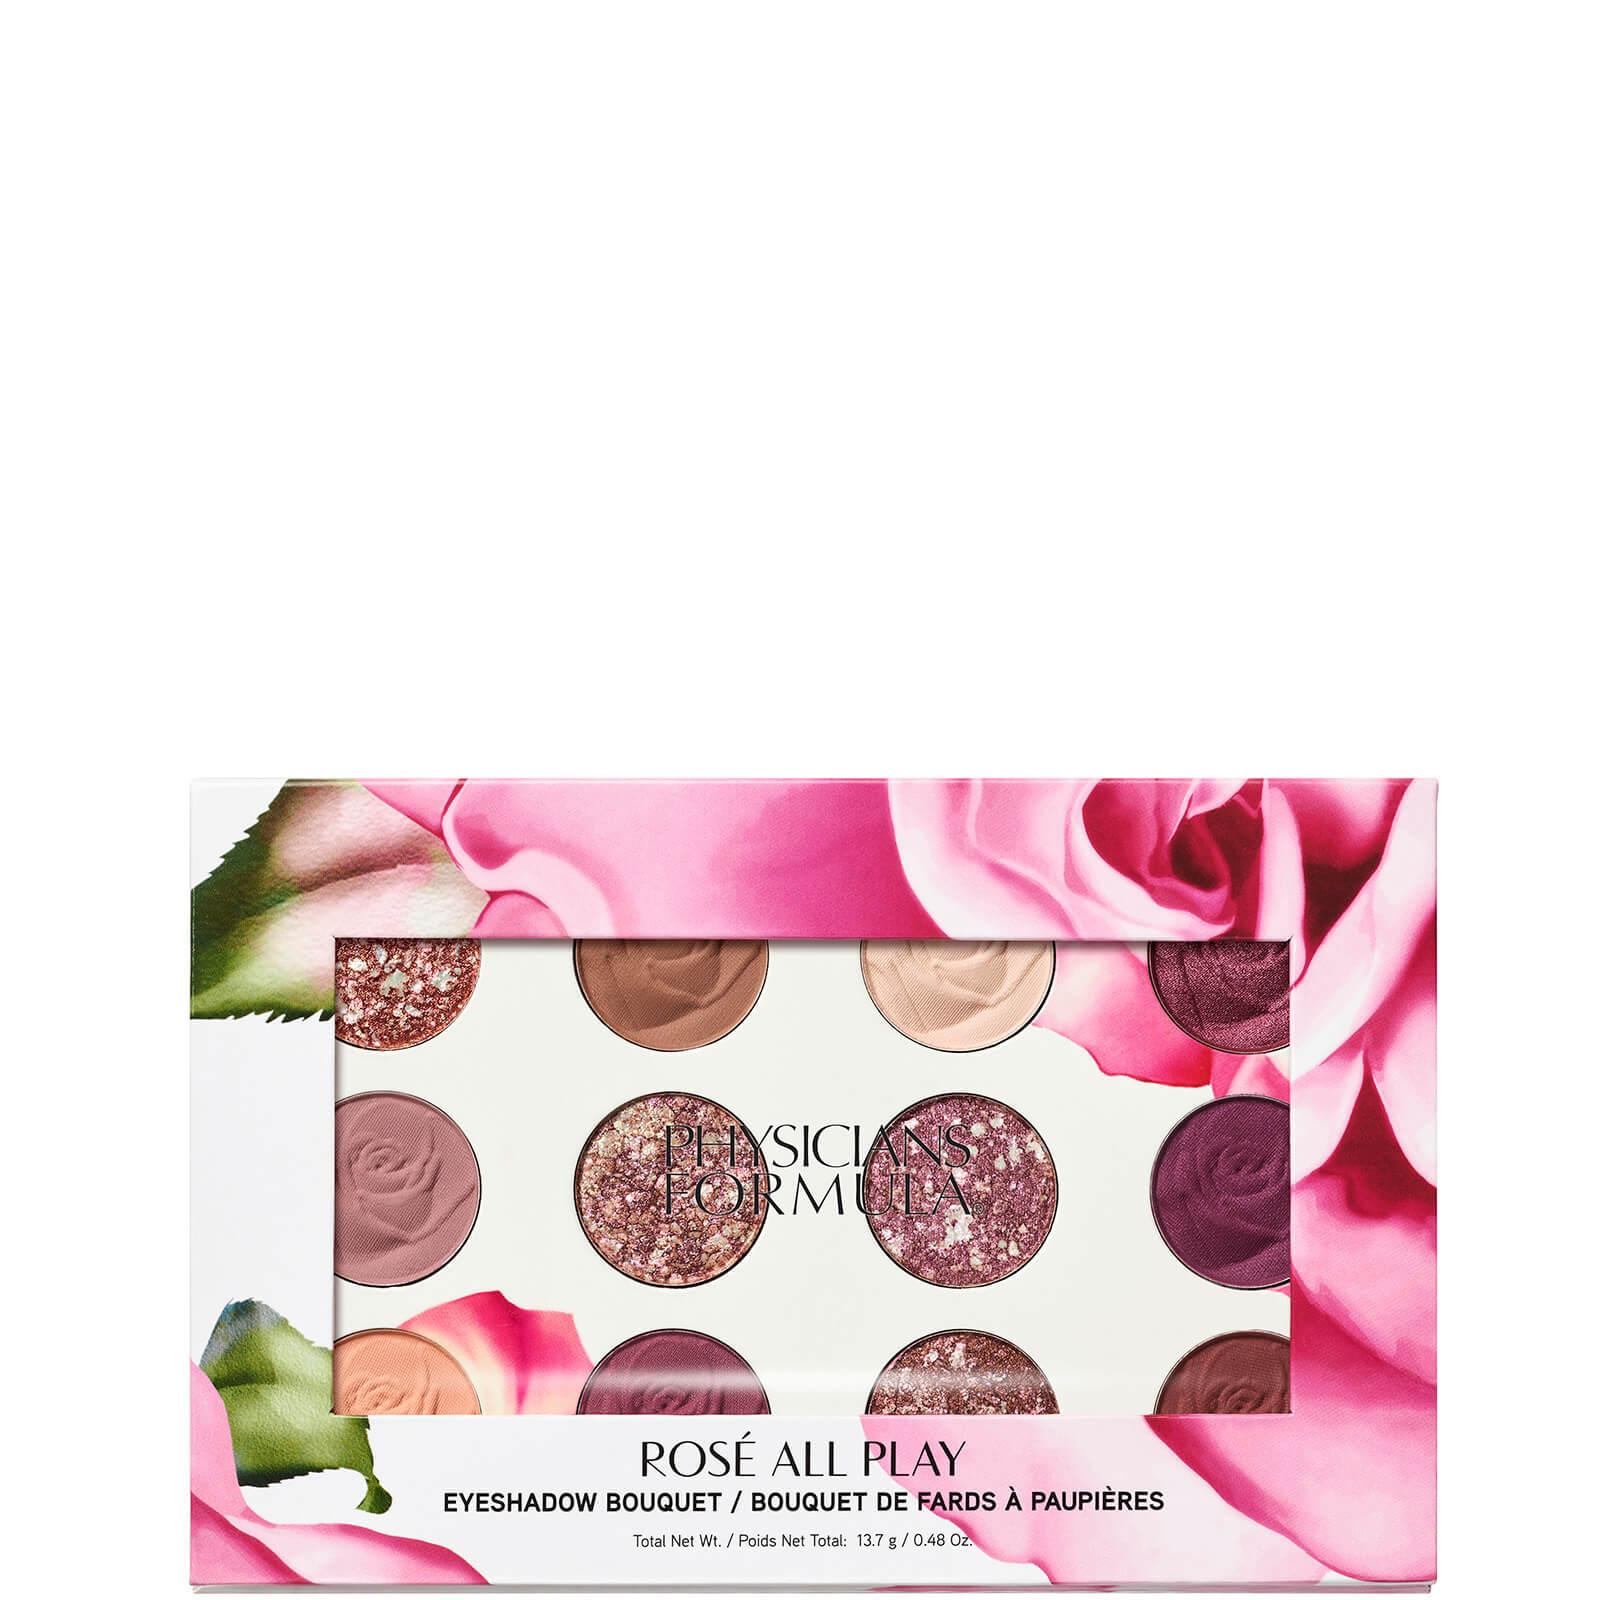 Купить Physicians Formula Rosé All Play Eyeshadow Bouquet Rosé